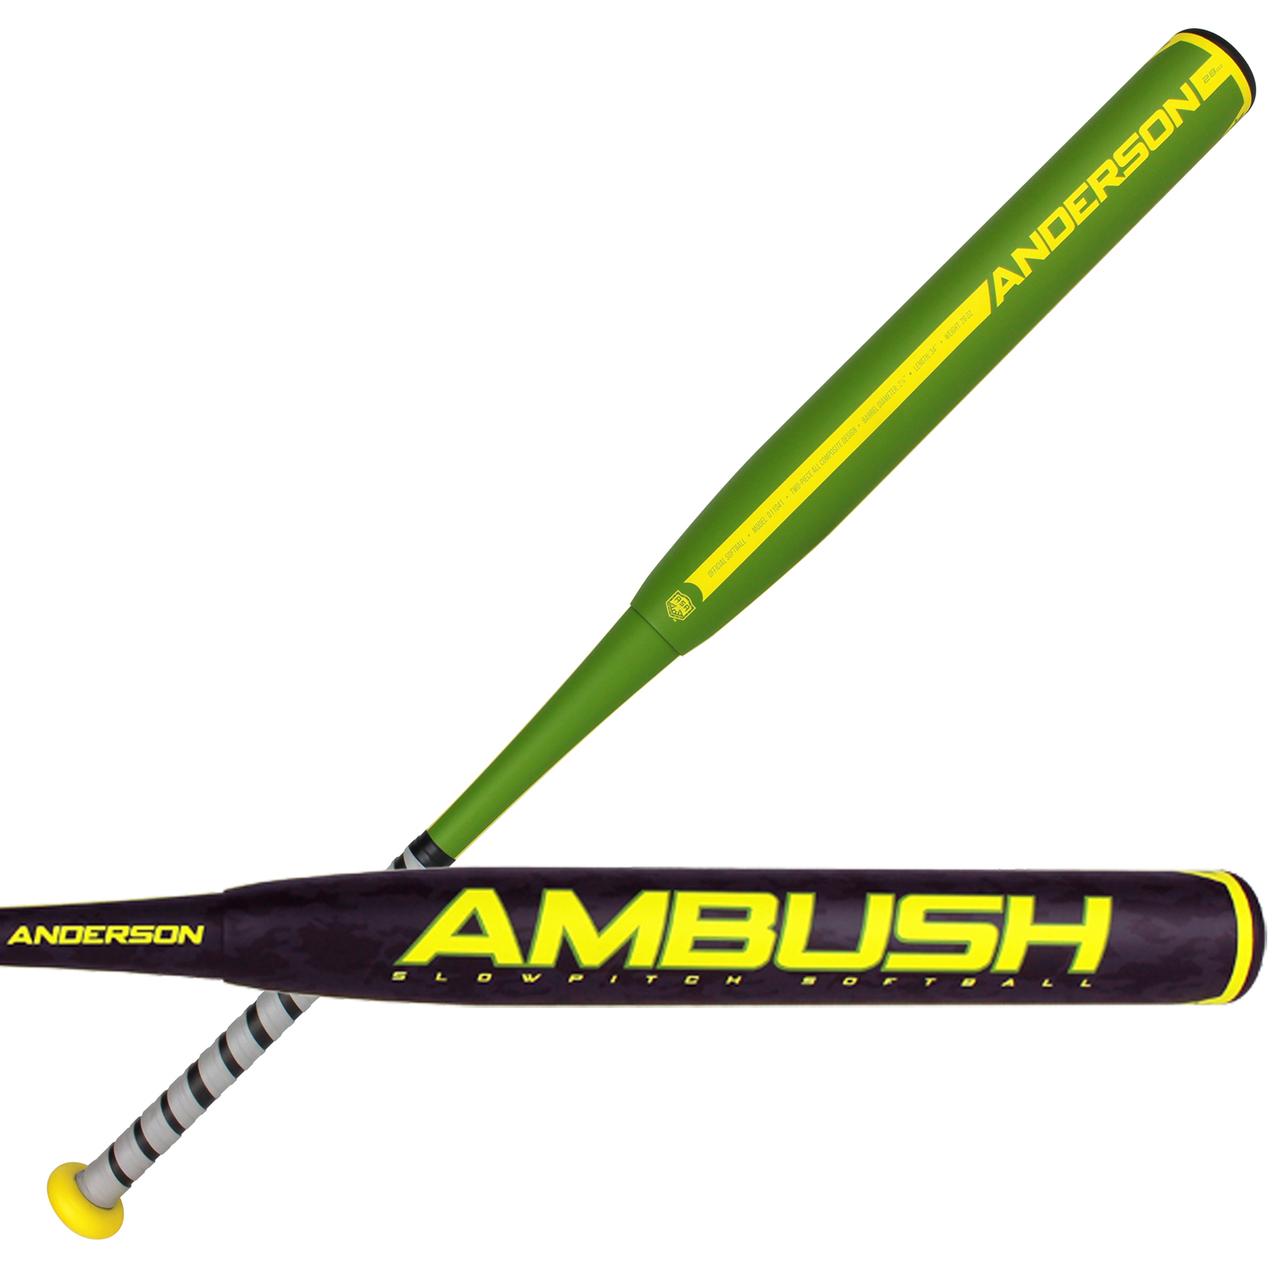 anderson-bat-company-ambush-asa-slow-pitch-softball-bat-34-inch-30-oz 110413430  874147007754 The 2017 <strong>Ambush Slow Pitch</strong> two piece composite bat is made